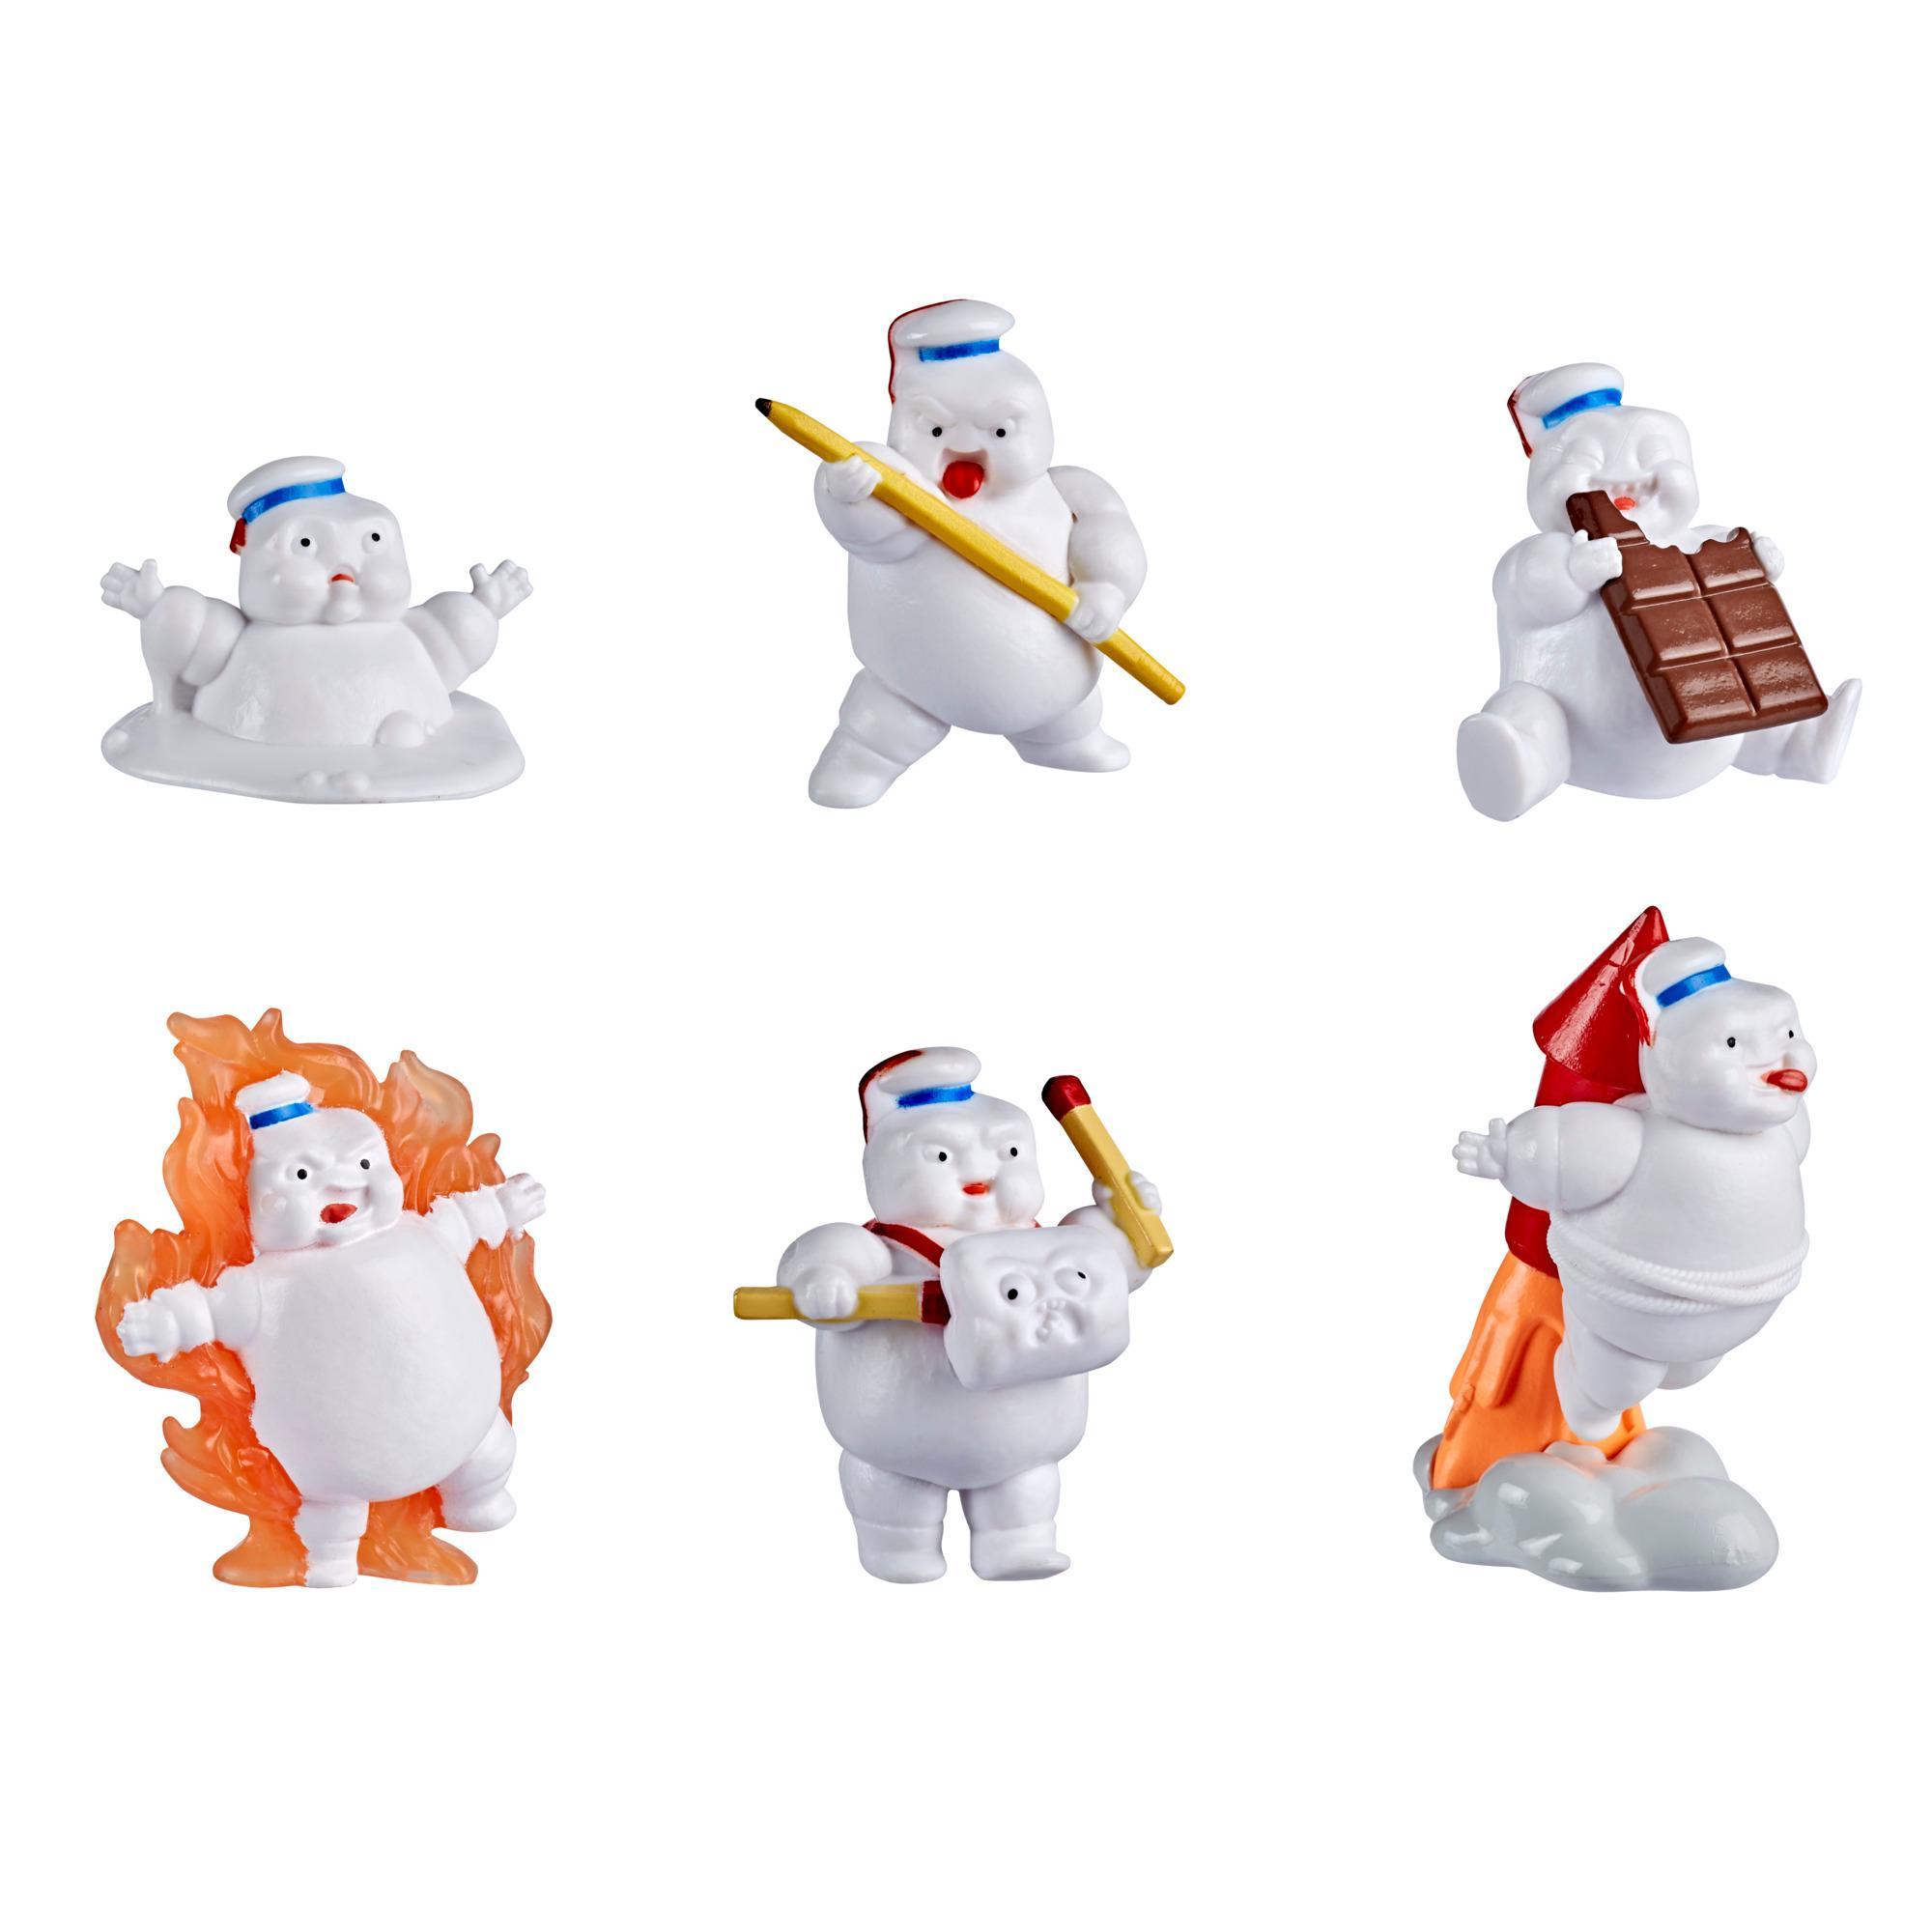 Ghostbusters Mini-Marshmallow Überraschung Serie 1